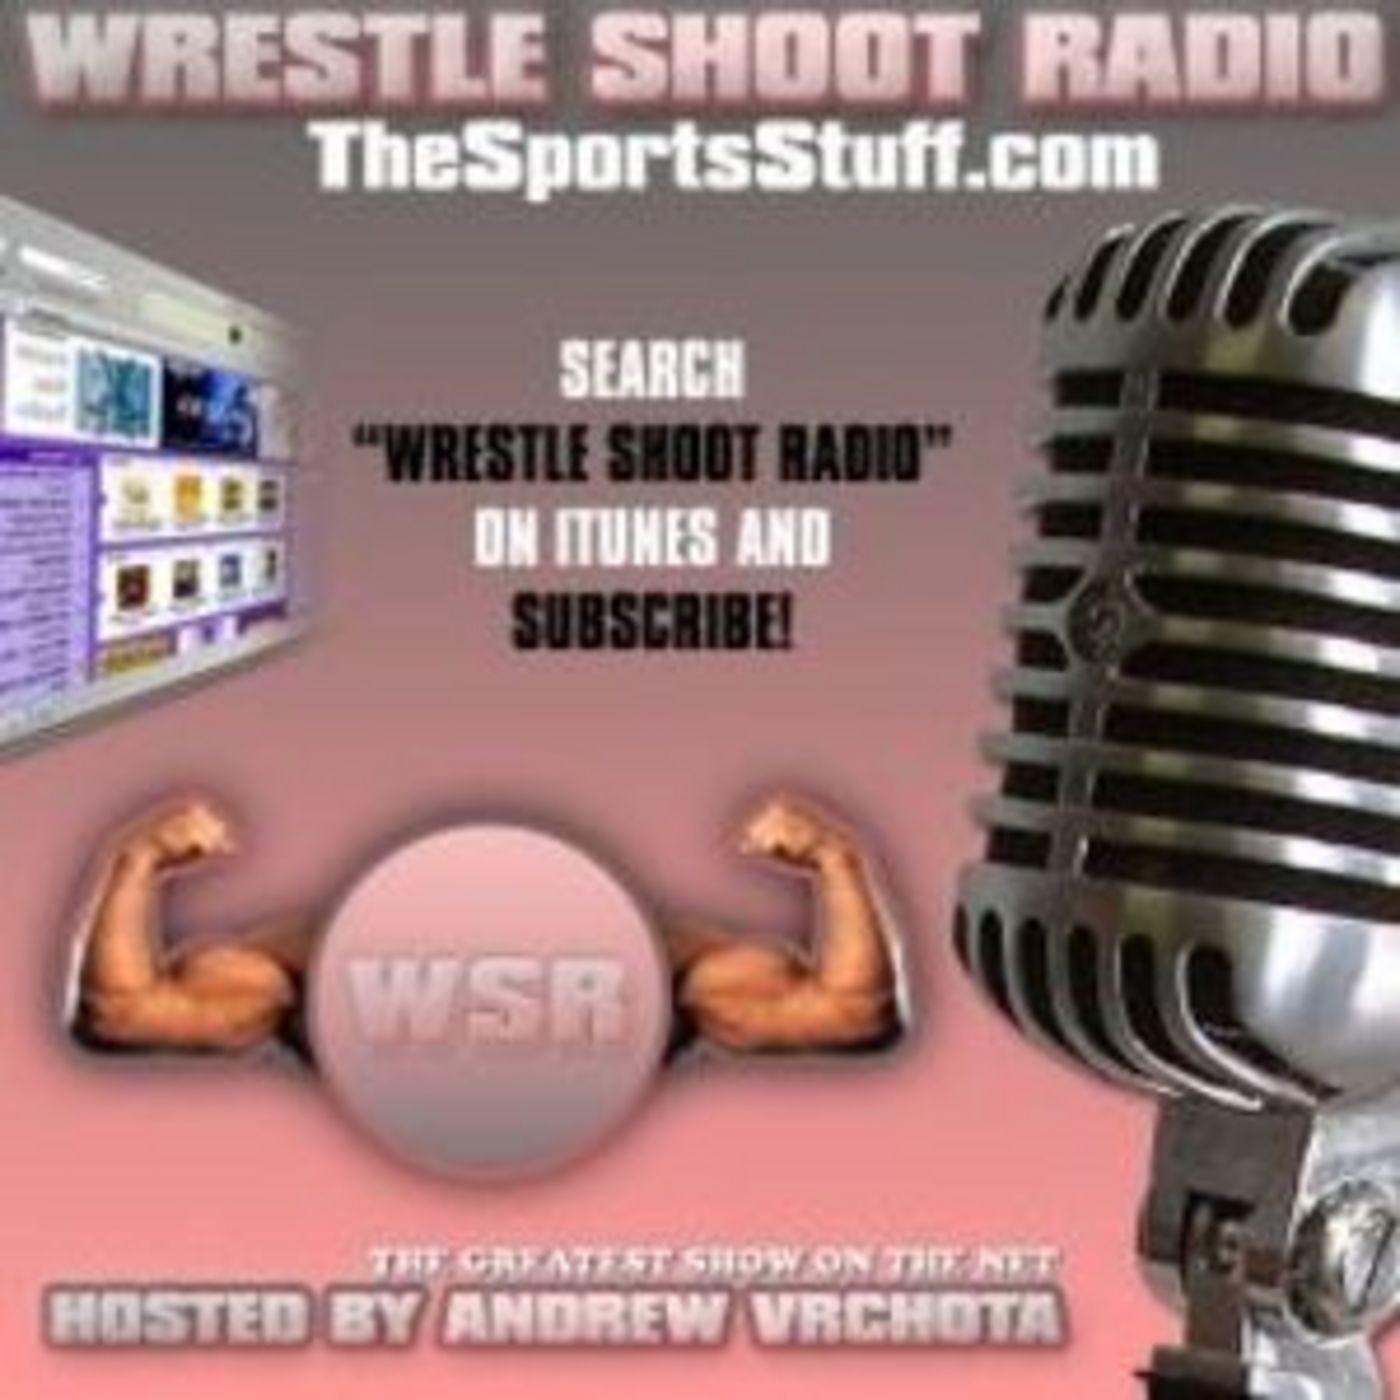 <![CDATA[TSS:Wrestle Shoot Radio]]>